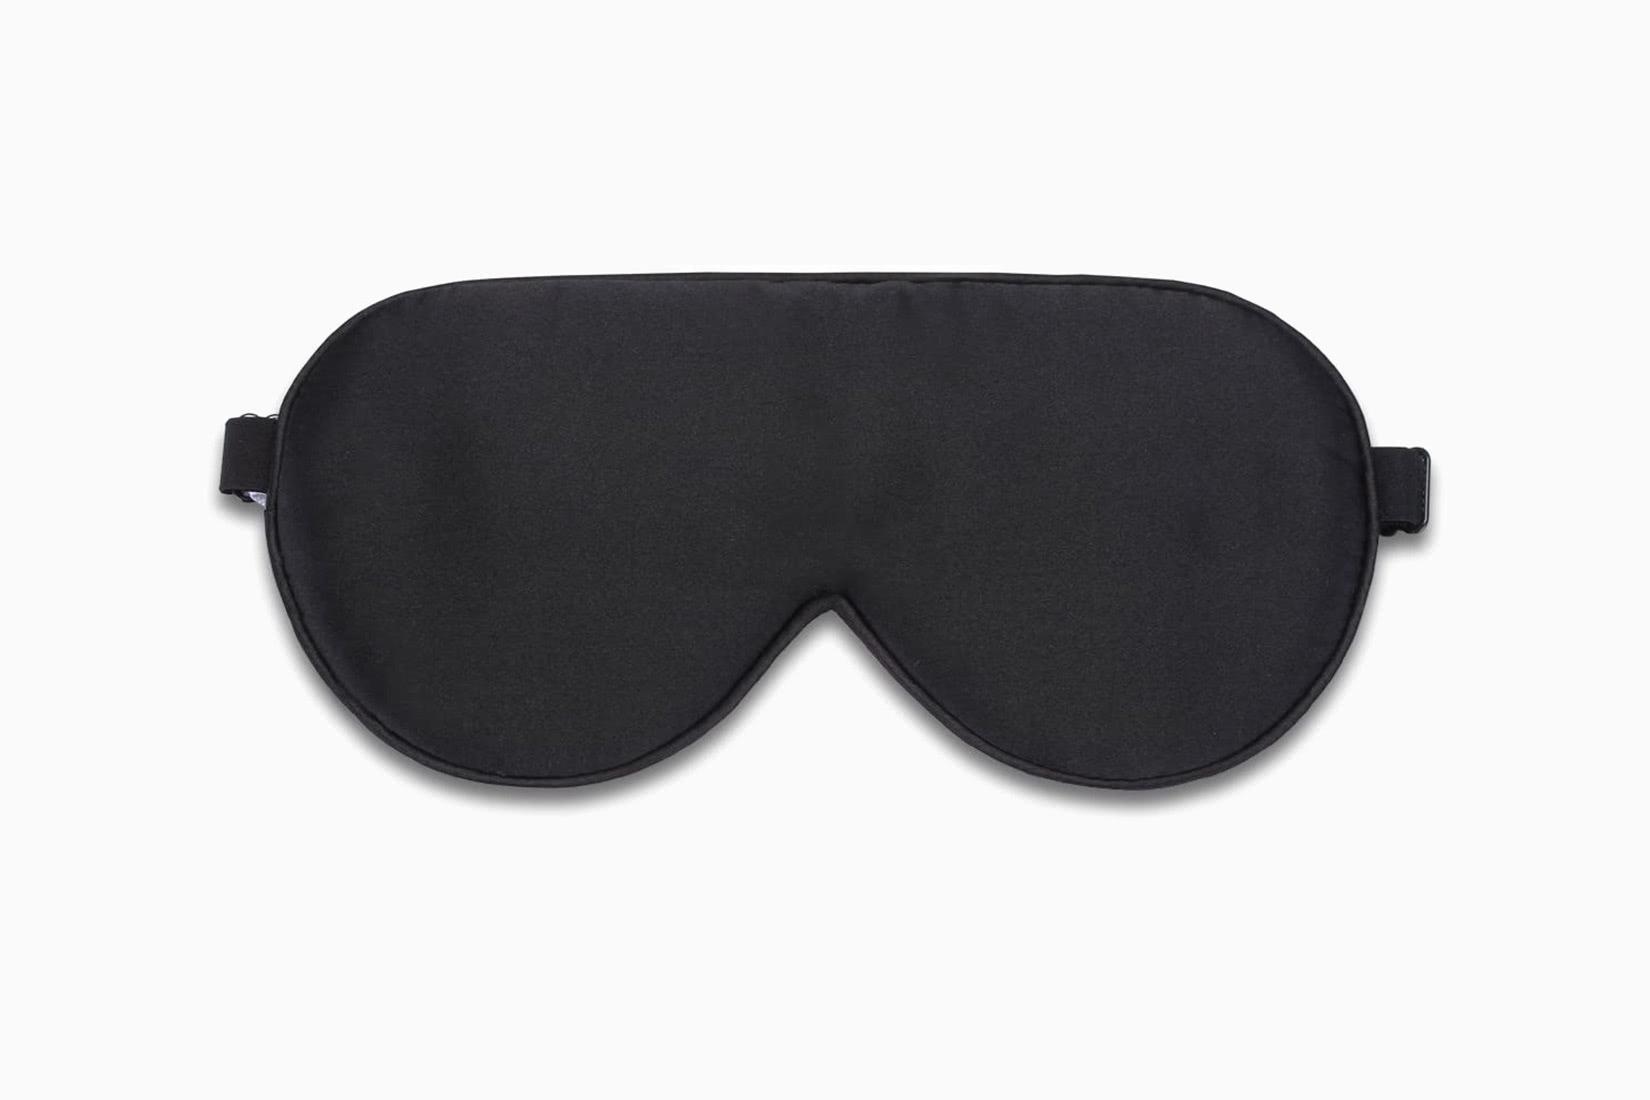 best sleep mask alaska bear silk - Luxe Digital